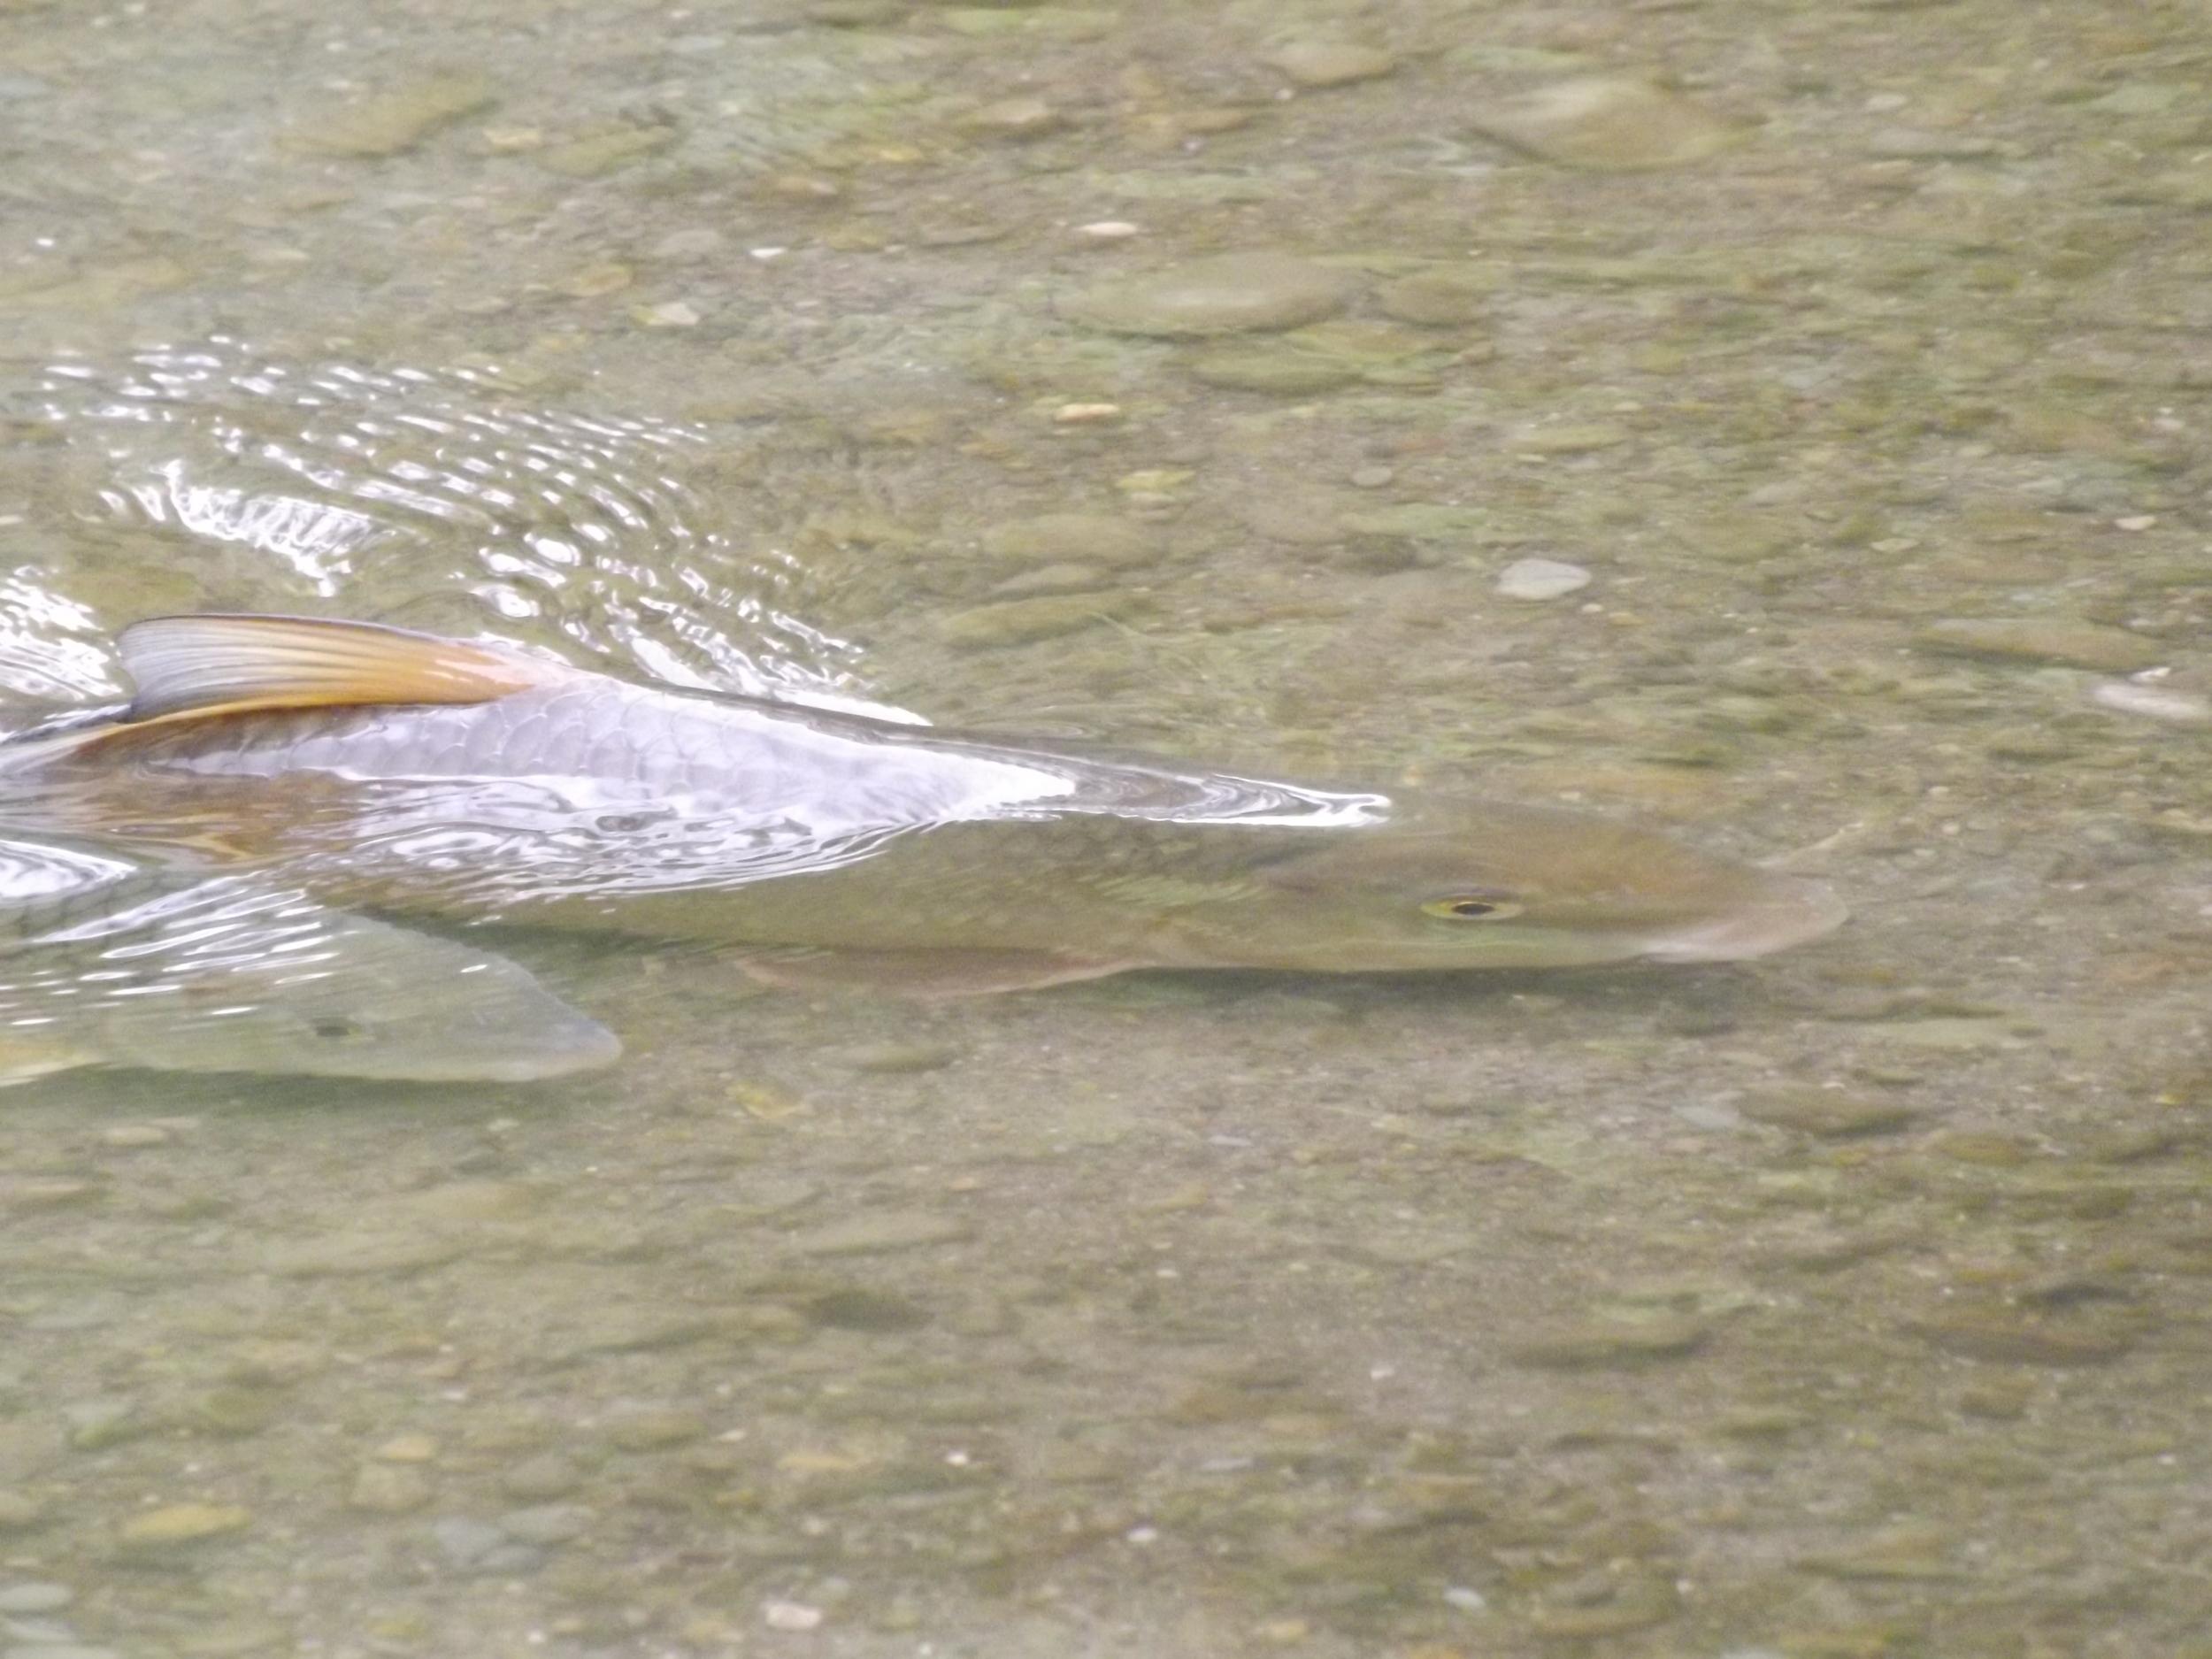 Common Carp working through the shallows   Cyprinus carpio   5.26.13